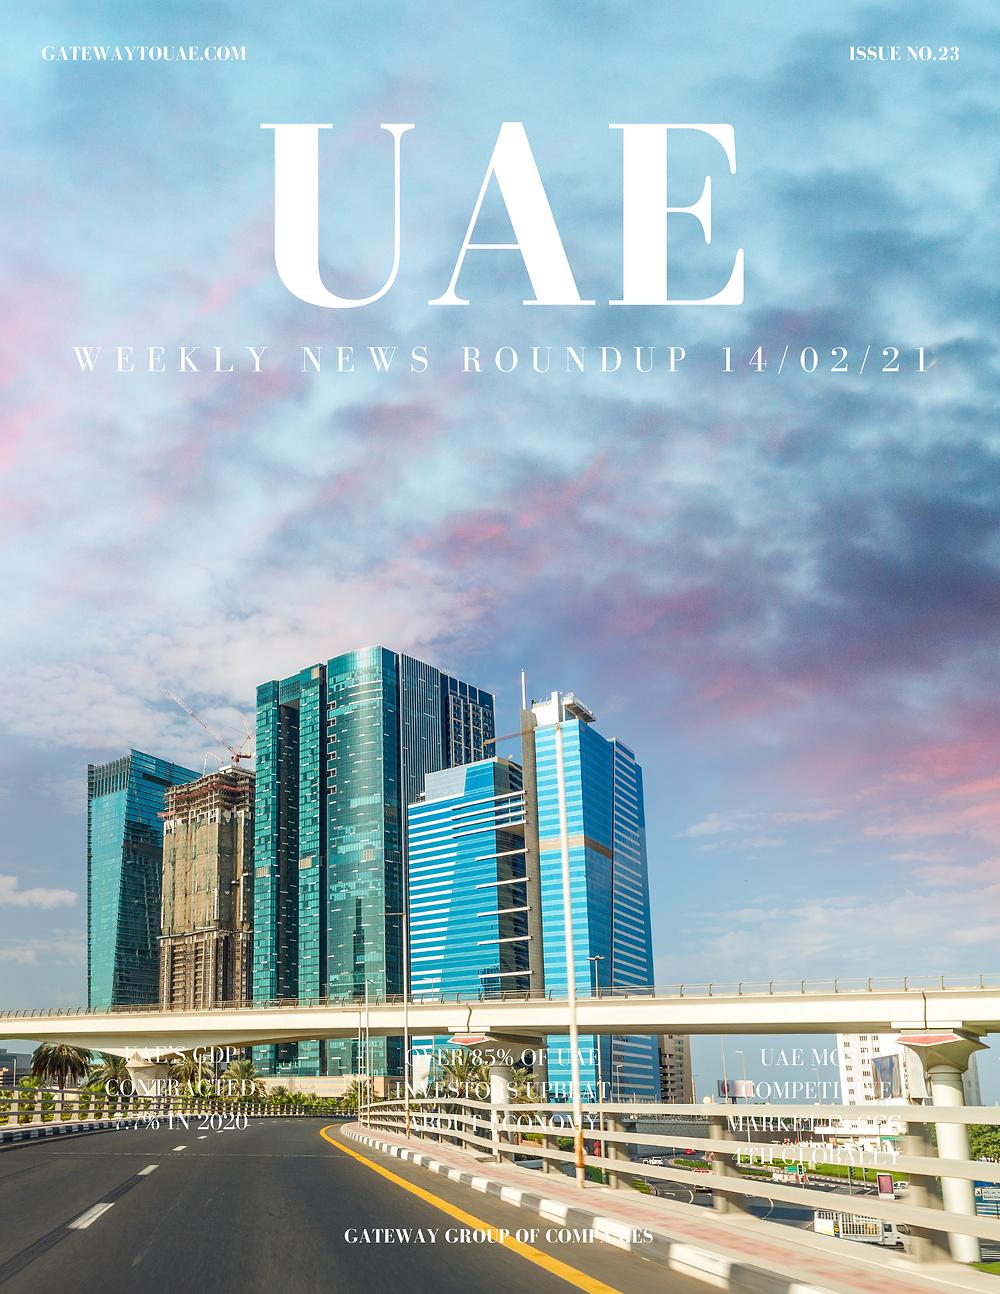 UAE business news headlines 14th February 2021 Issue 23 Gateway Group Of Companies Abu Dhabi Dubai weekly magazine company formation business setup local sponsor service agent visas